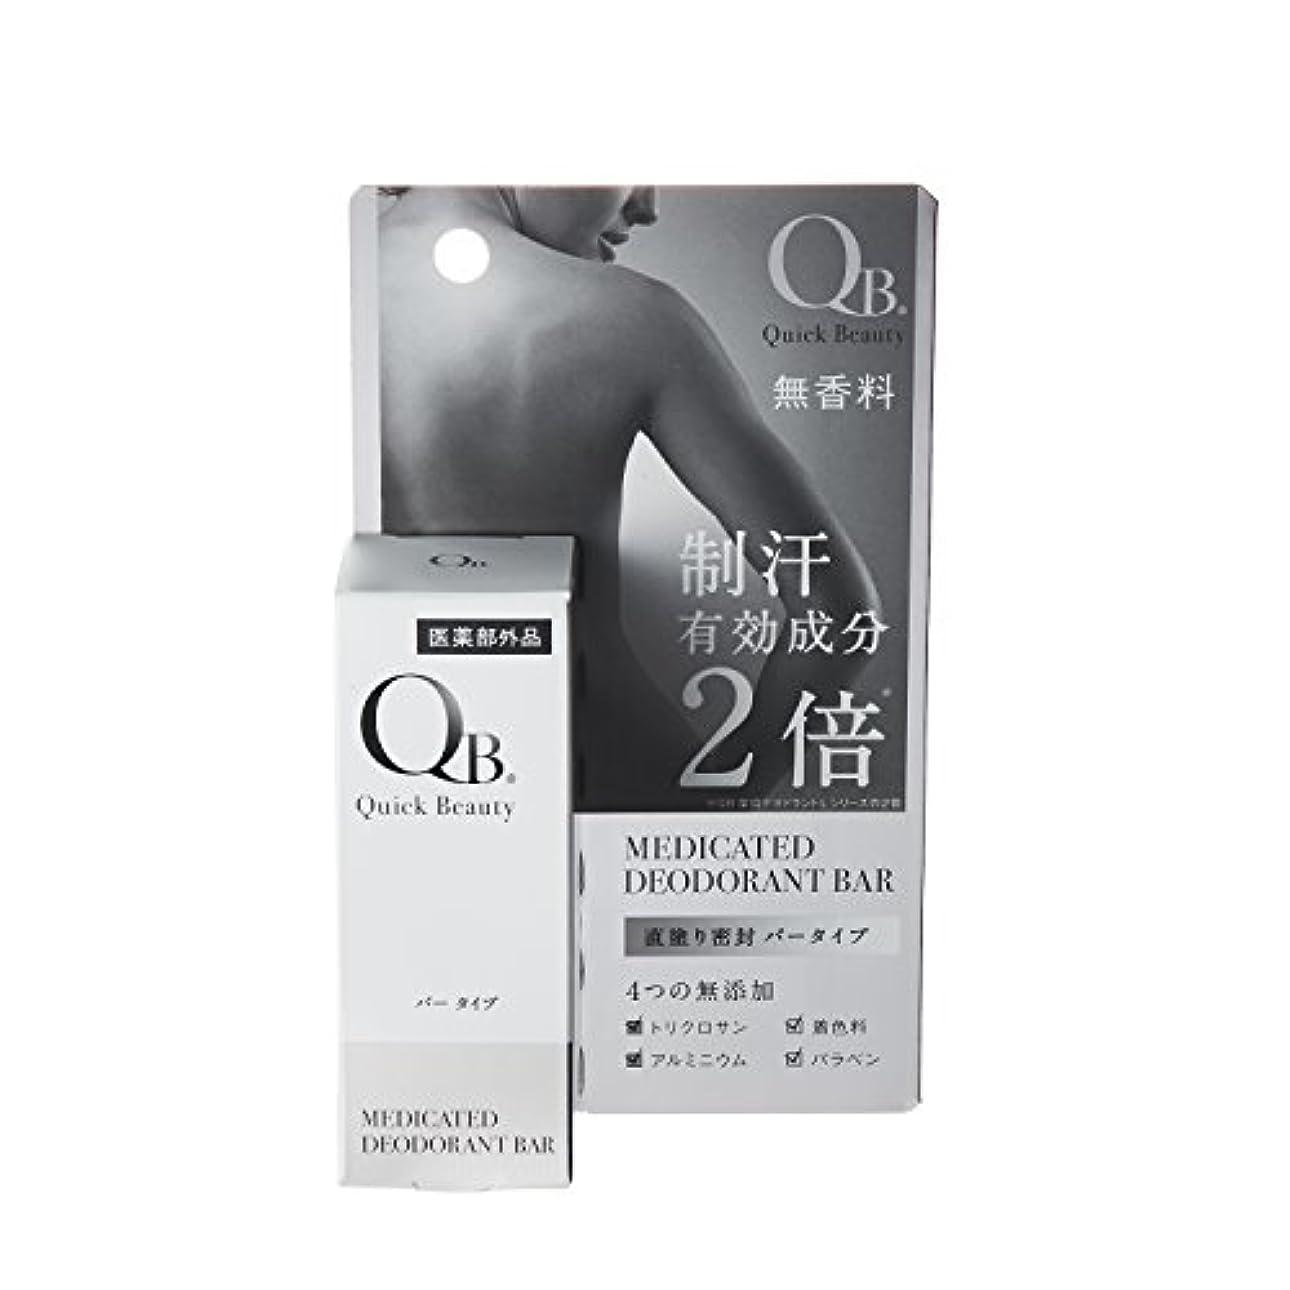 QB 薬用デオドラントバー 20g